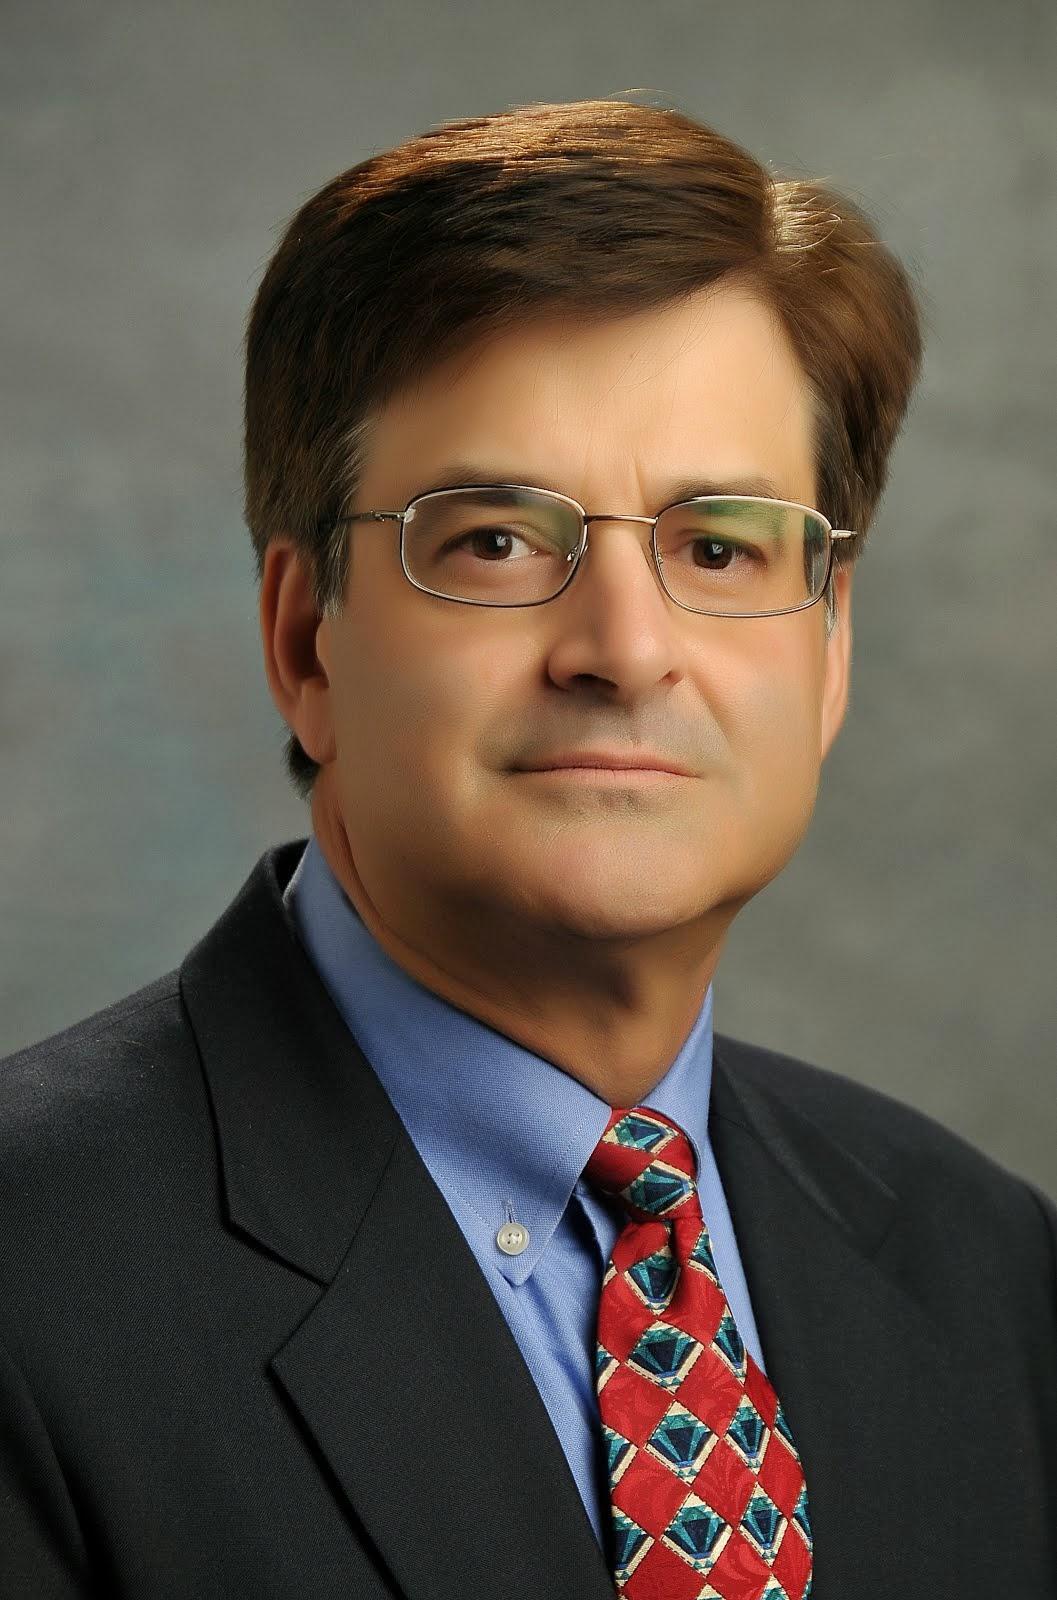 Cary Calderone